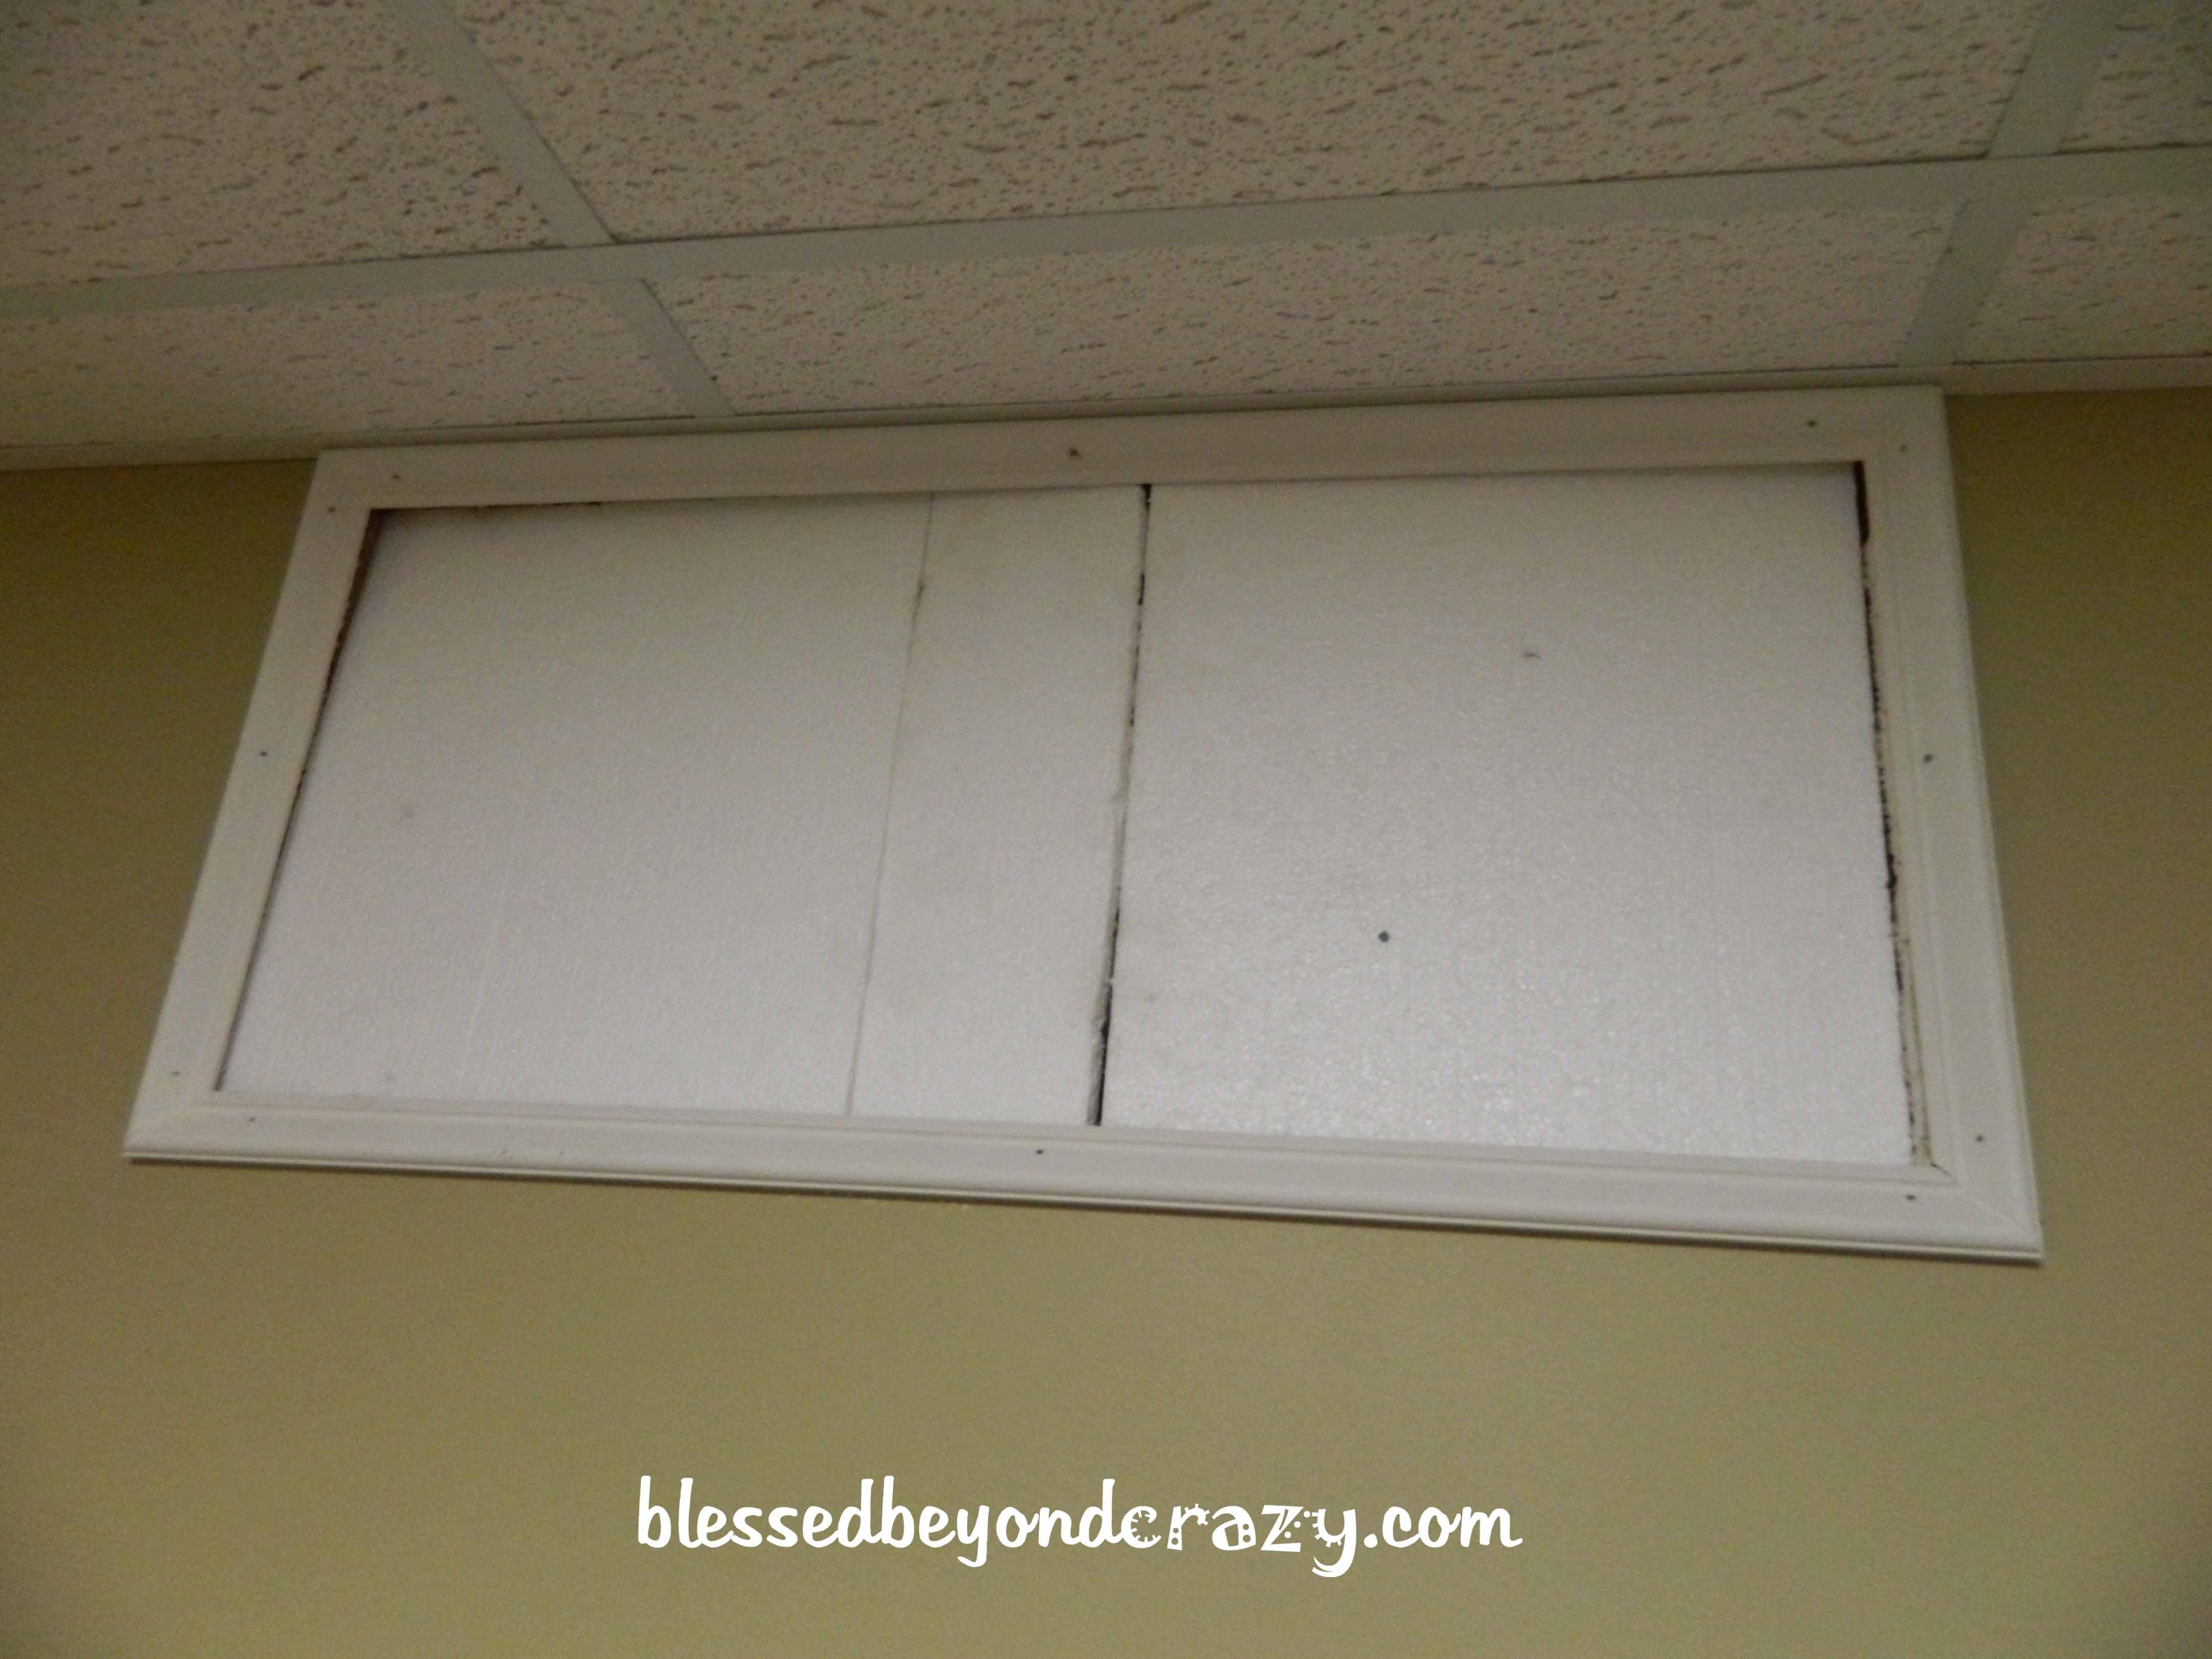 insulate basement windows natashamillerweb rh natashamillerweb com insulated basement windows Insulated Window Shades